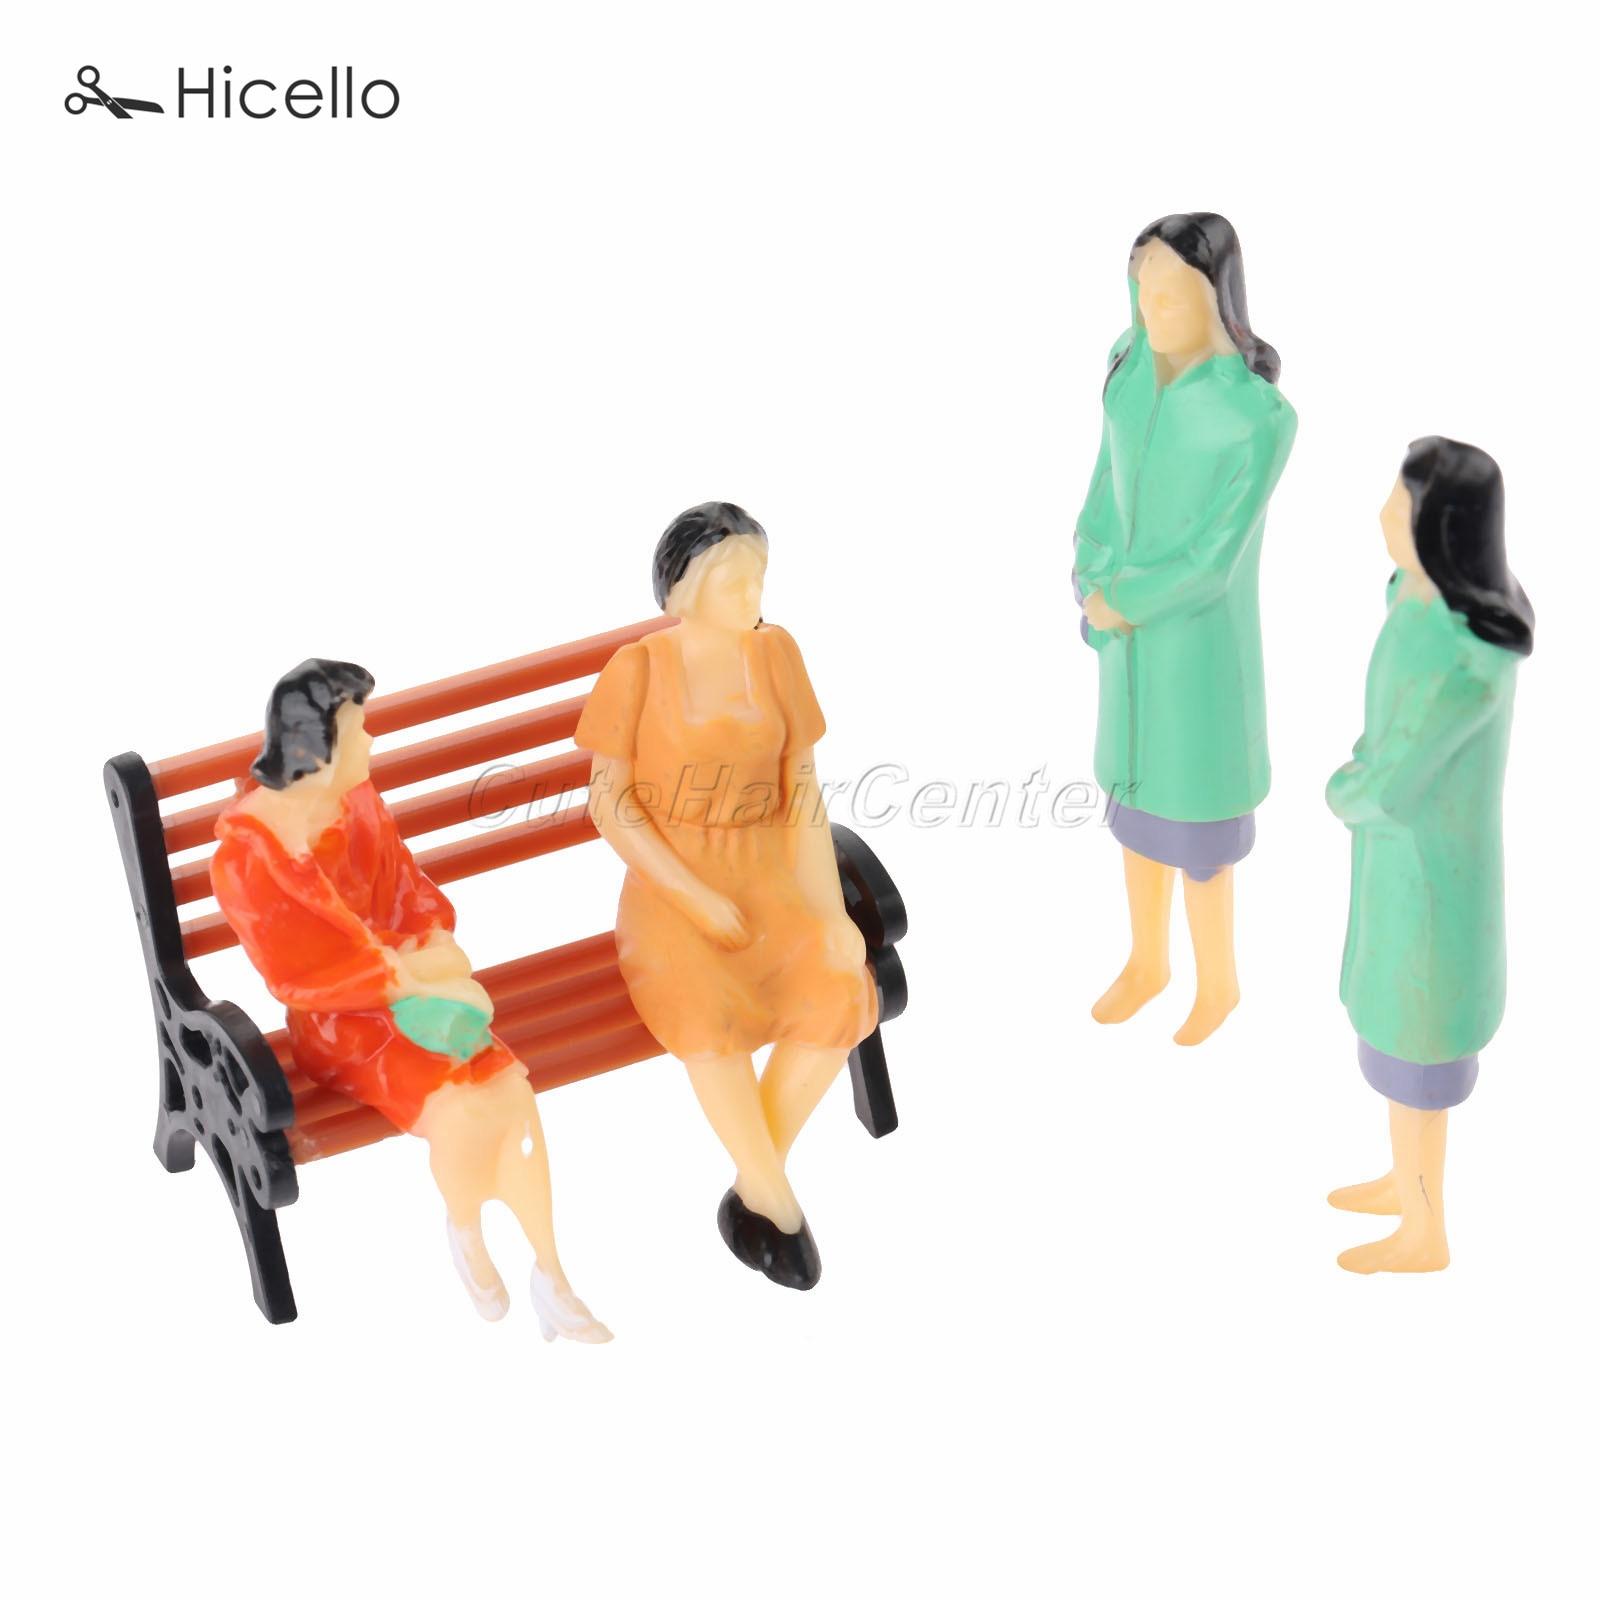 10pcs 1:30 multicolor Model People 65mm+ 5pcs Model park bench model 42mm plastic human chair figures scenery simulation